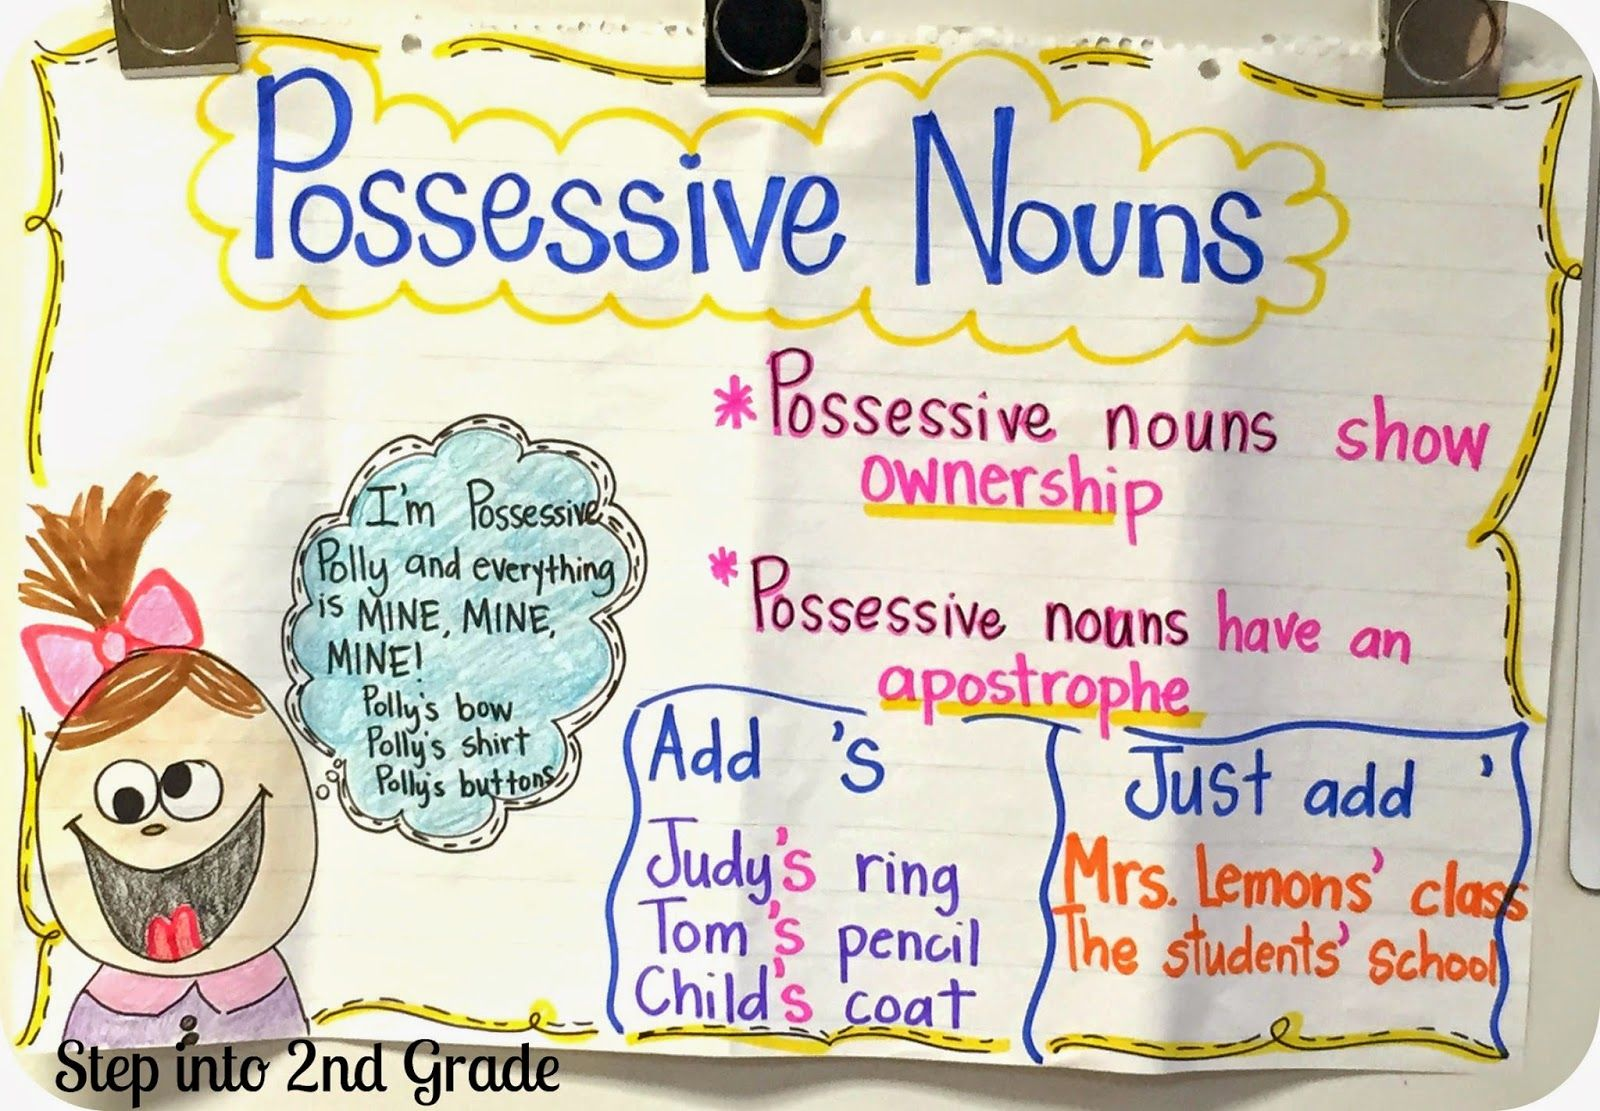 small resolution of Possessive Nouns (Step into 2nd Grade with Mrs. Lemons)   Possessive nouns